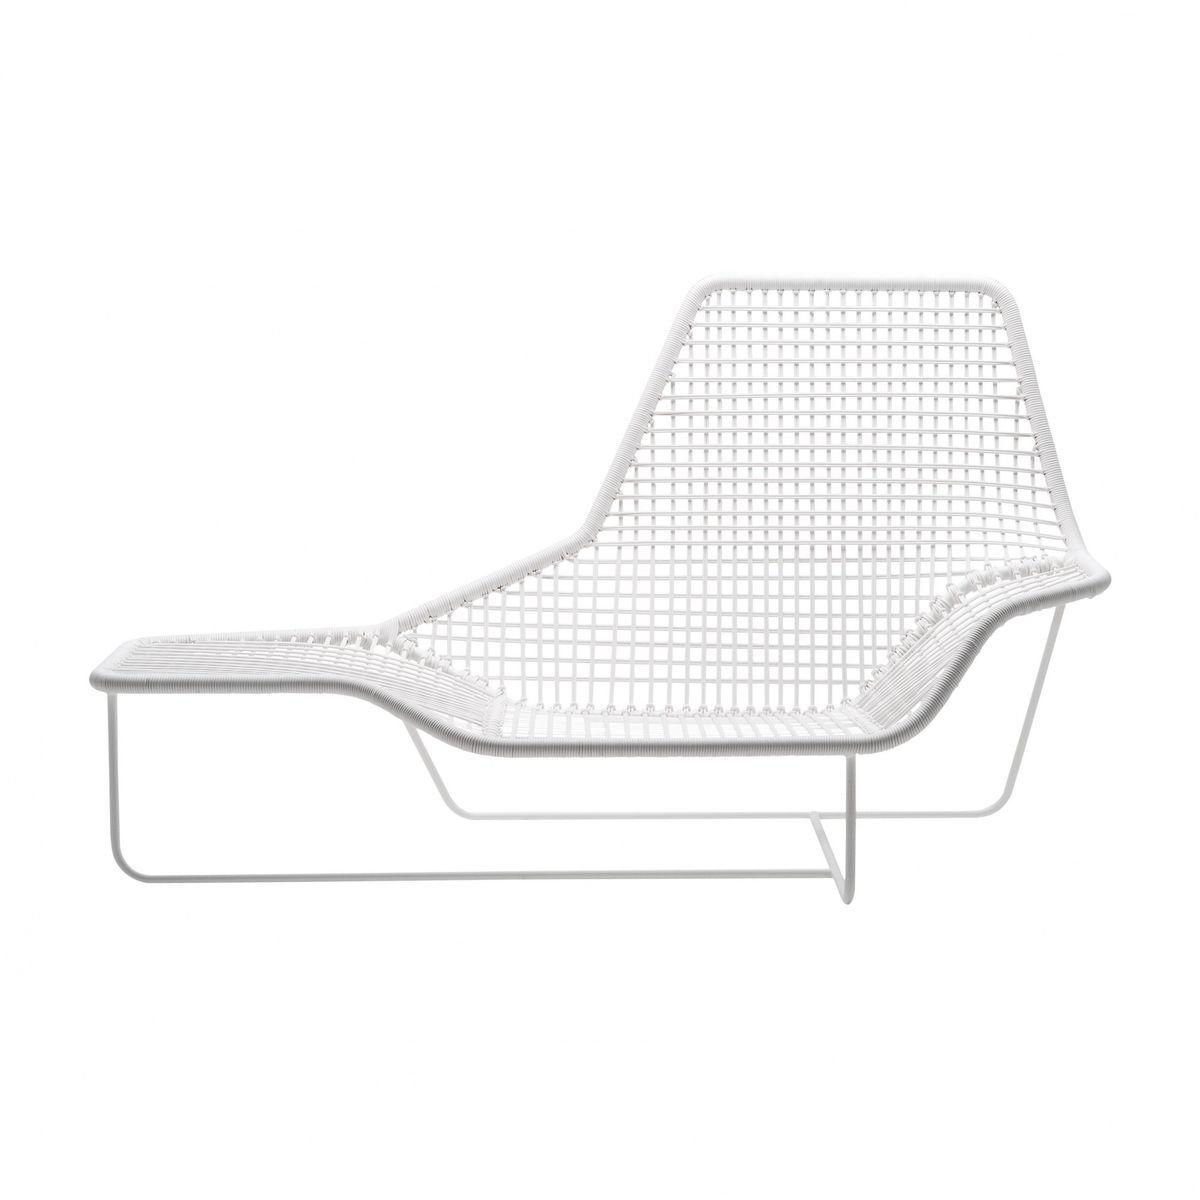 Schön Zanotta   Lama Outdoor Chaiselongue   Weiß/lackierter Stahl